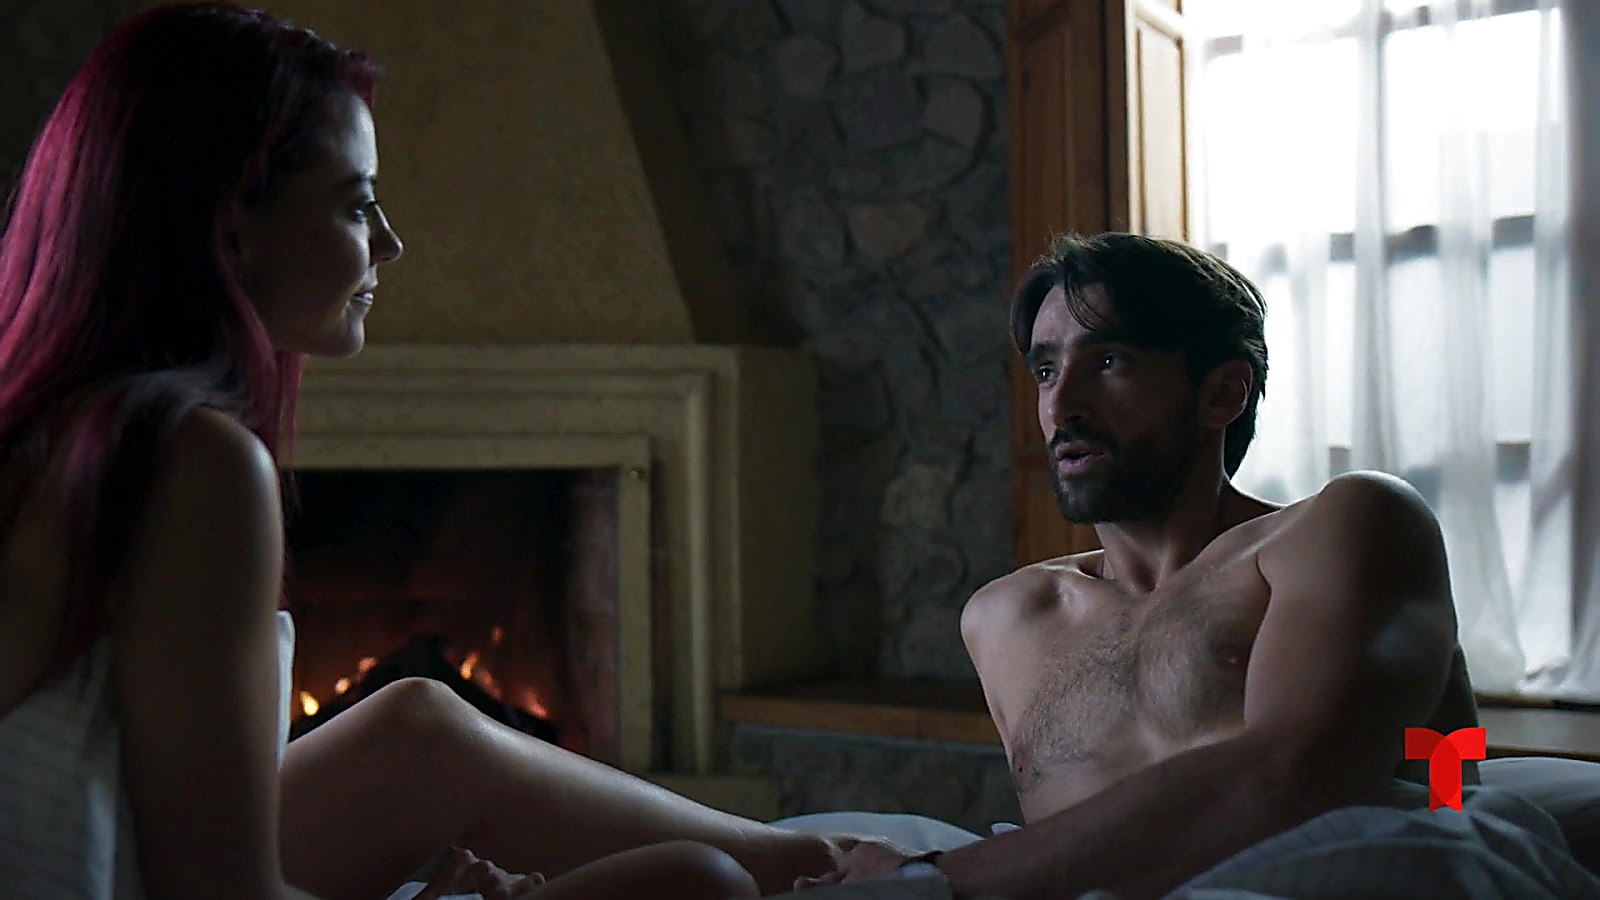 Aitor Luna sexy shirtless scene July 2, 2020, 5am